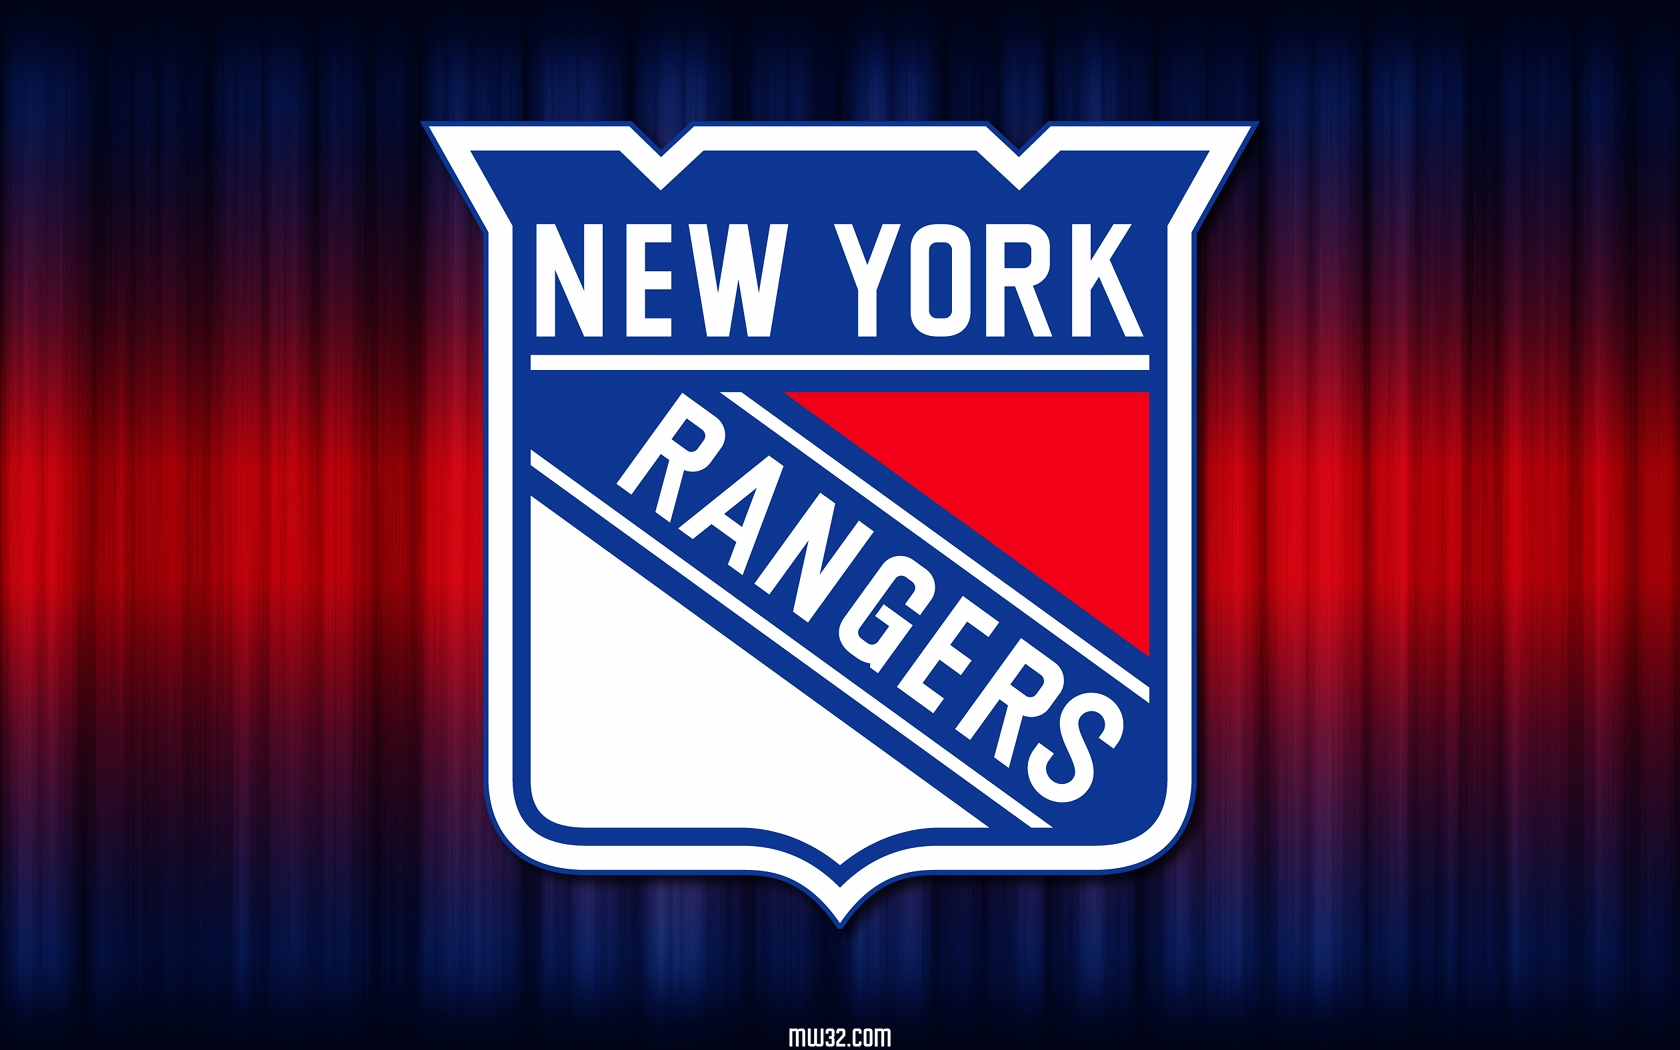 494150 New York Rangers Wallpapers 1680x1050